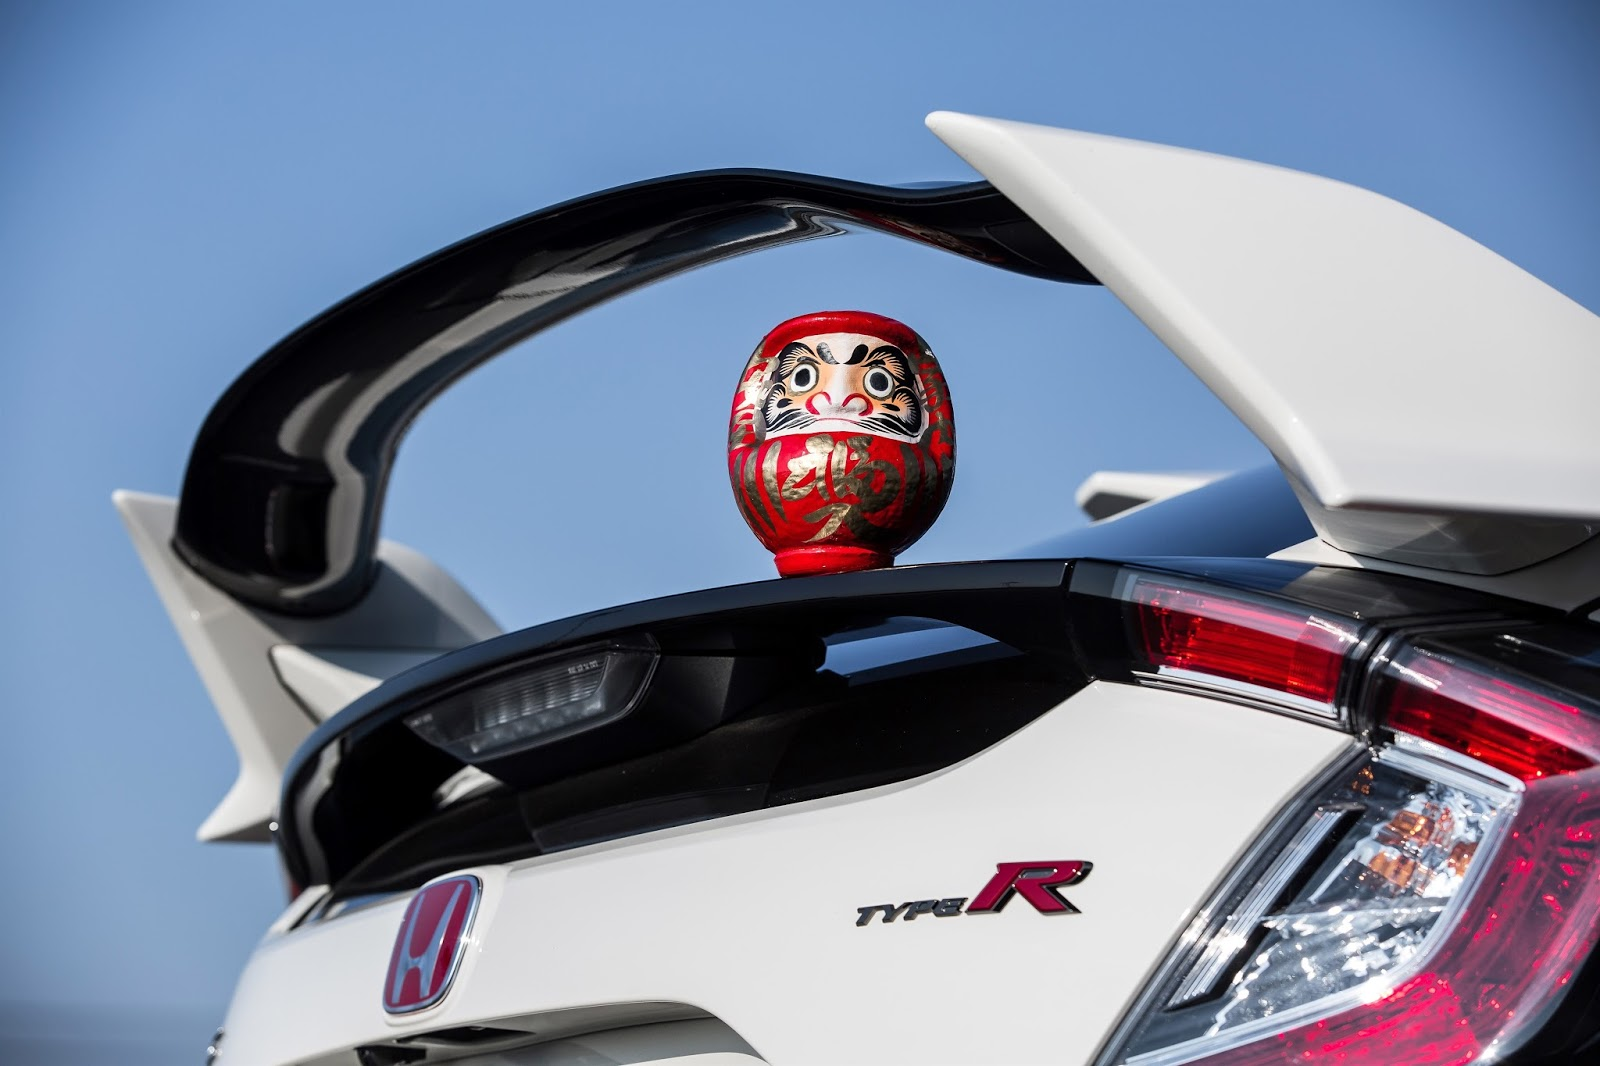 106410 2017 HONDA CIVIC TYPE R SETS NEW FRONT WHEEL DRIVE LAP RECORD AT Το Honda Civic Type-R ανέκτησε το στέμμα του, στην πίστα του Nurburgring Honda, Honda Civic, Honda Civic Type R, Hot Hatch, lap time, Nurburgring, videos, zblog